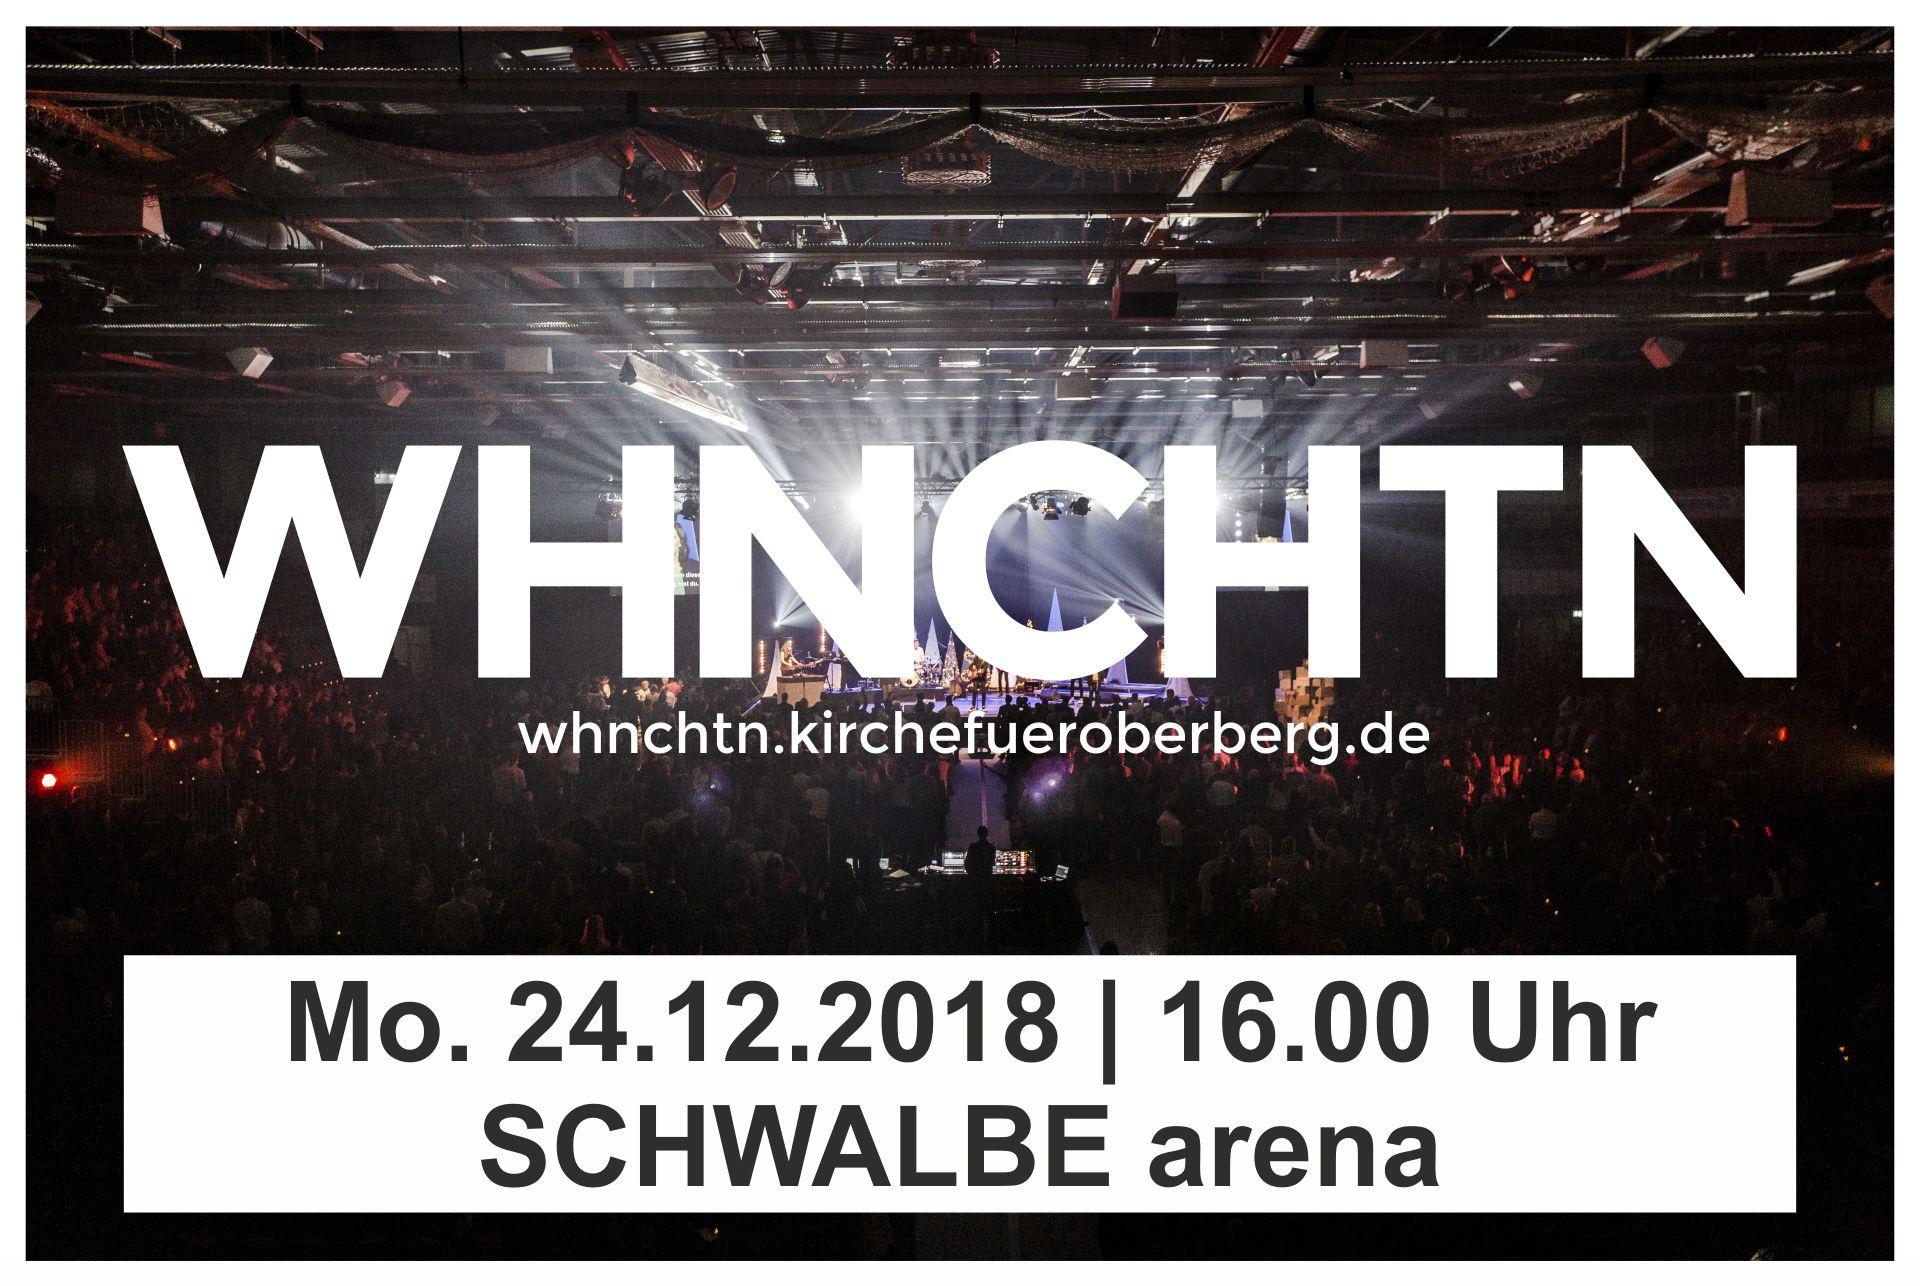 Events | SCHWALBE arena